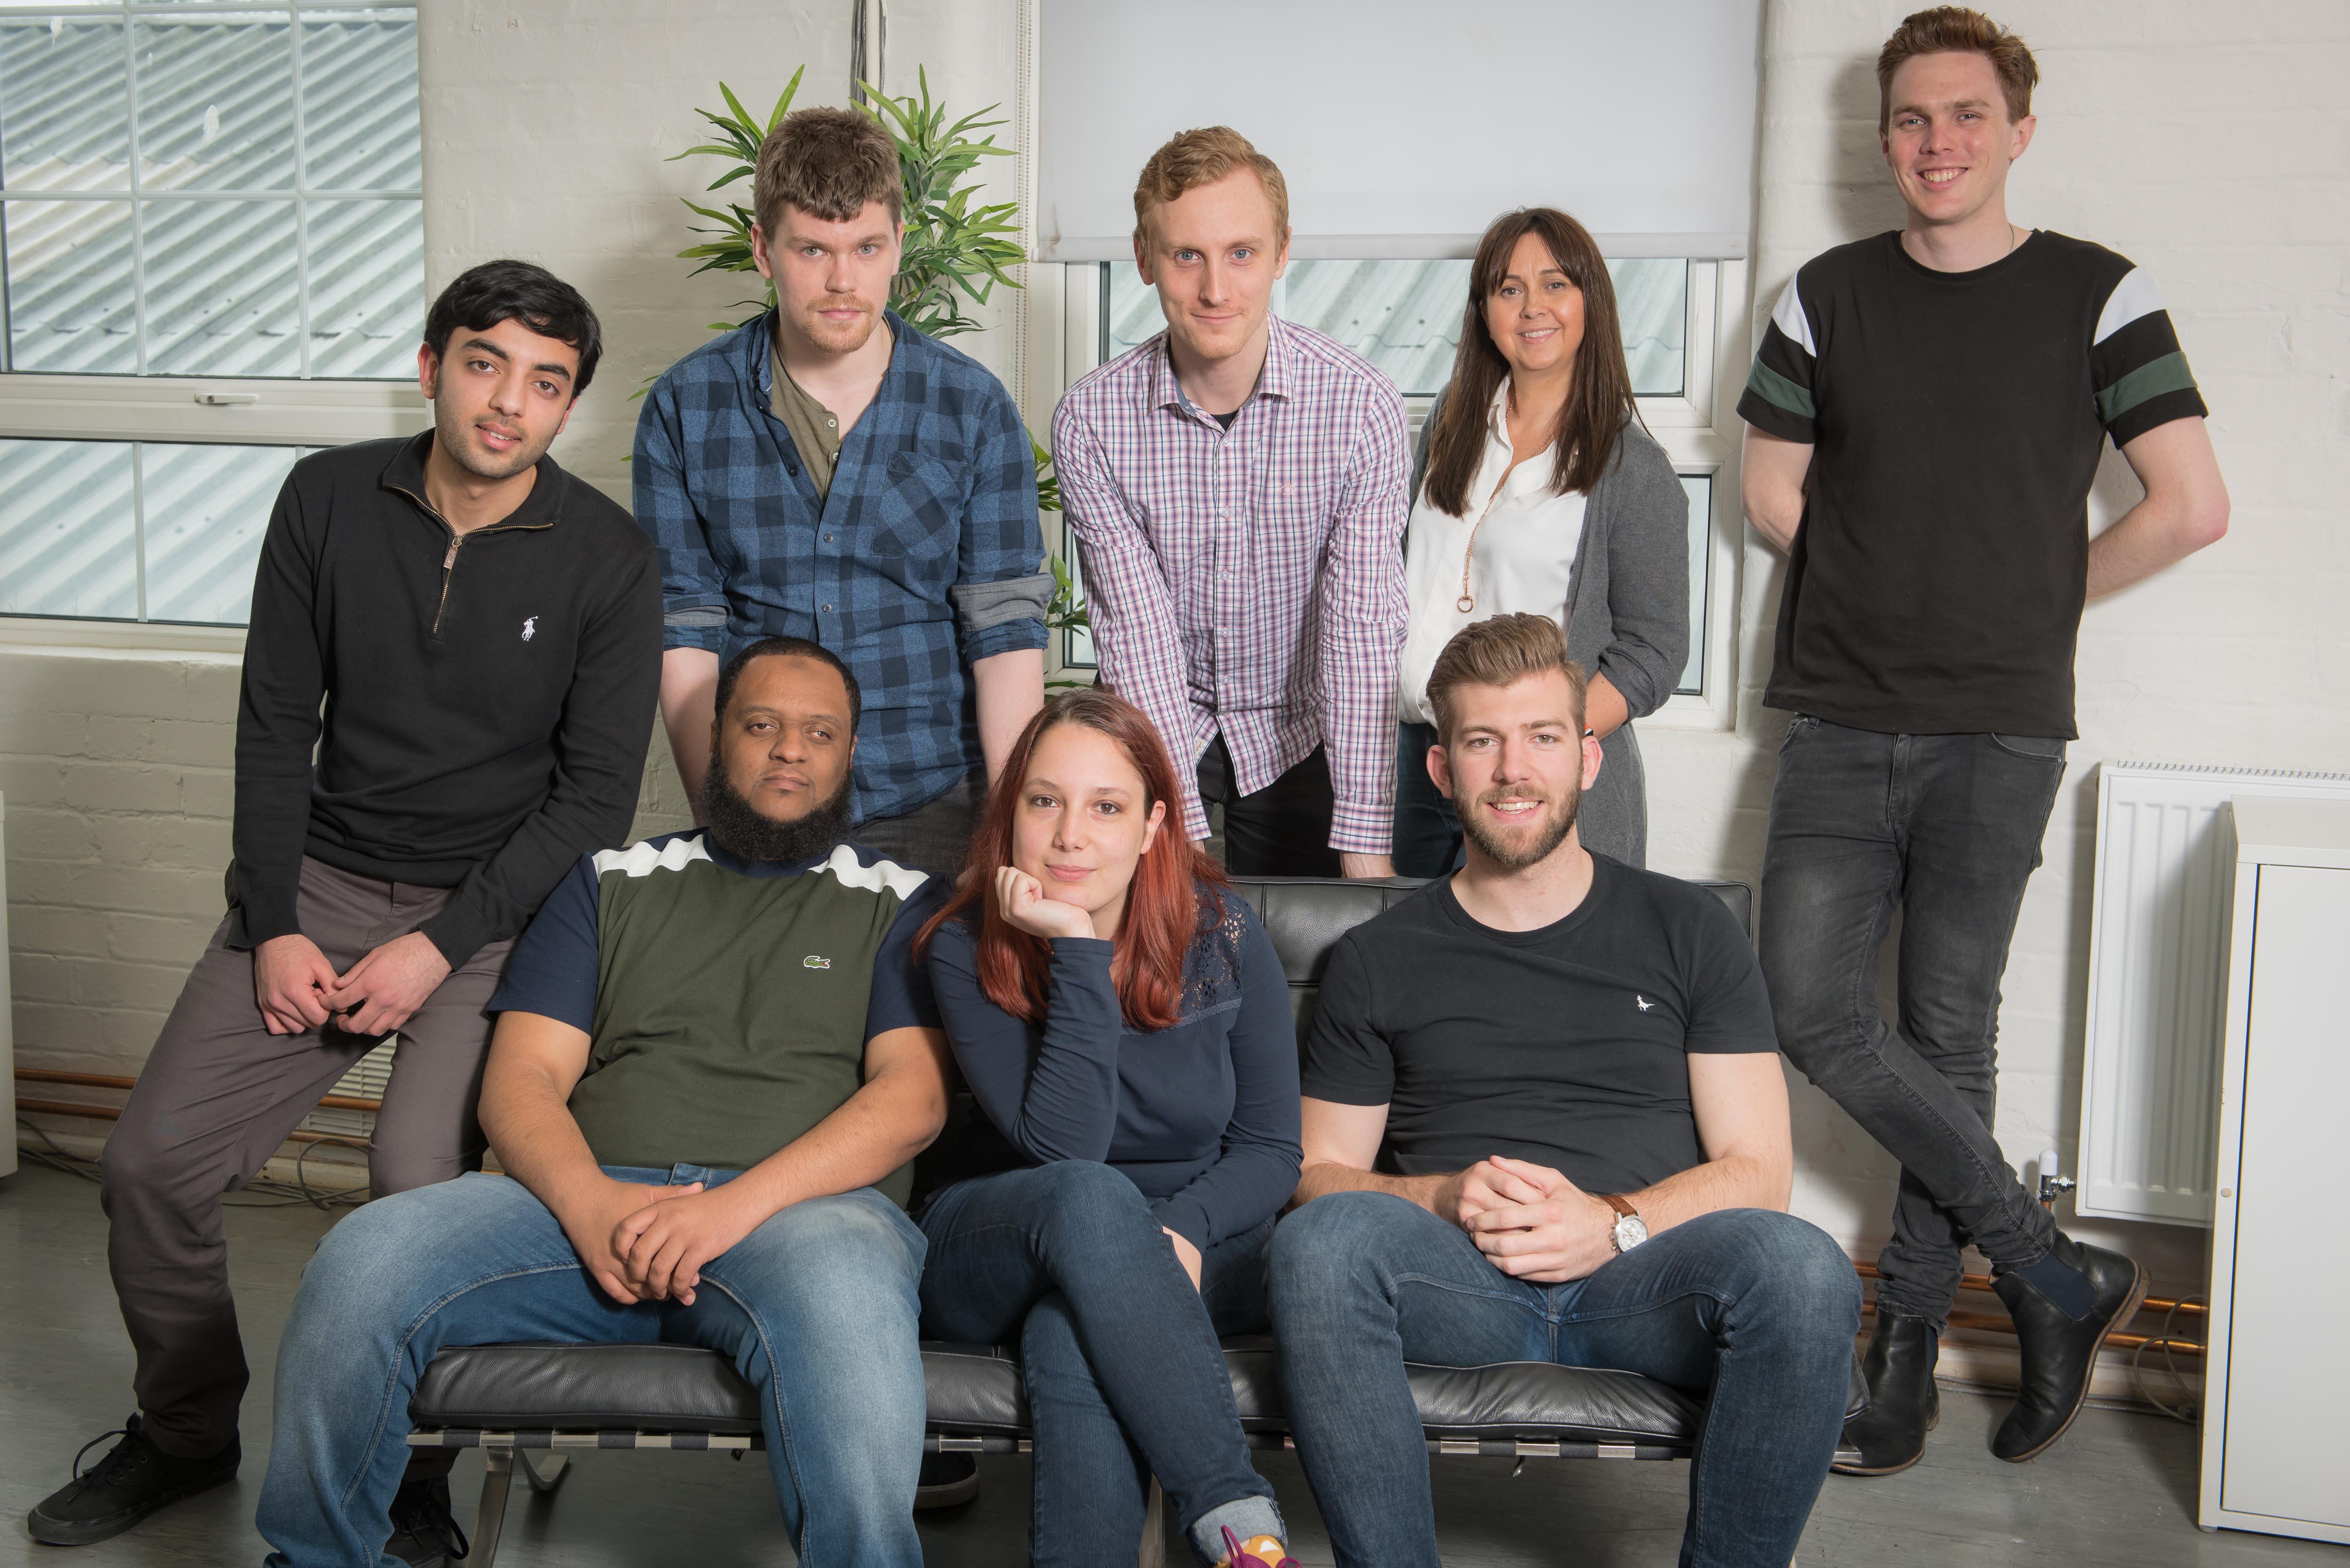 members of the Williams Commerce digital marketing agency